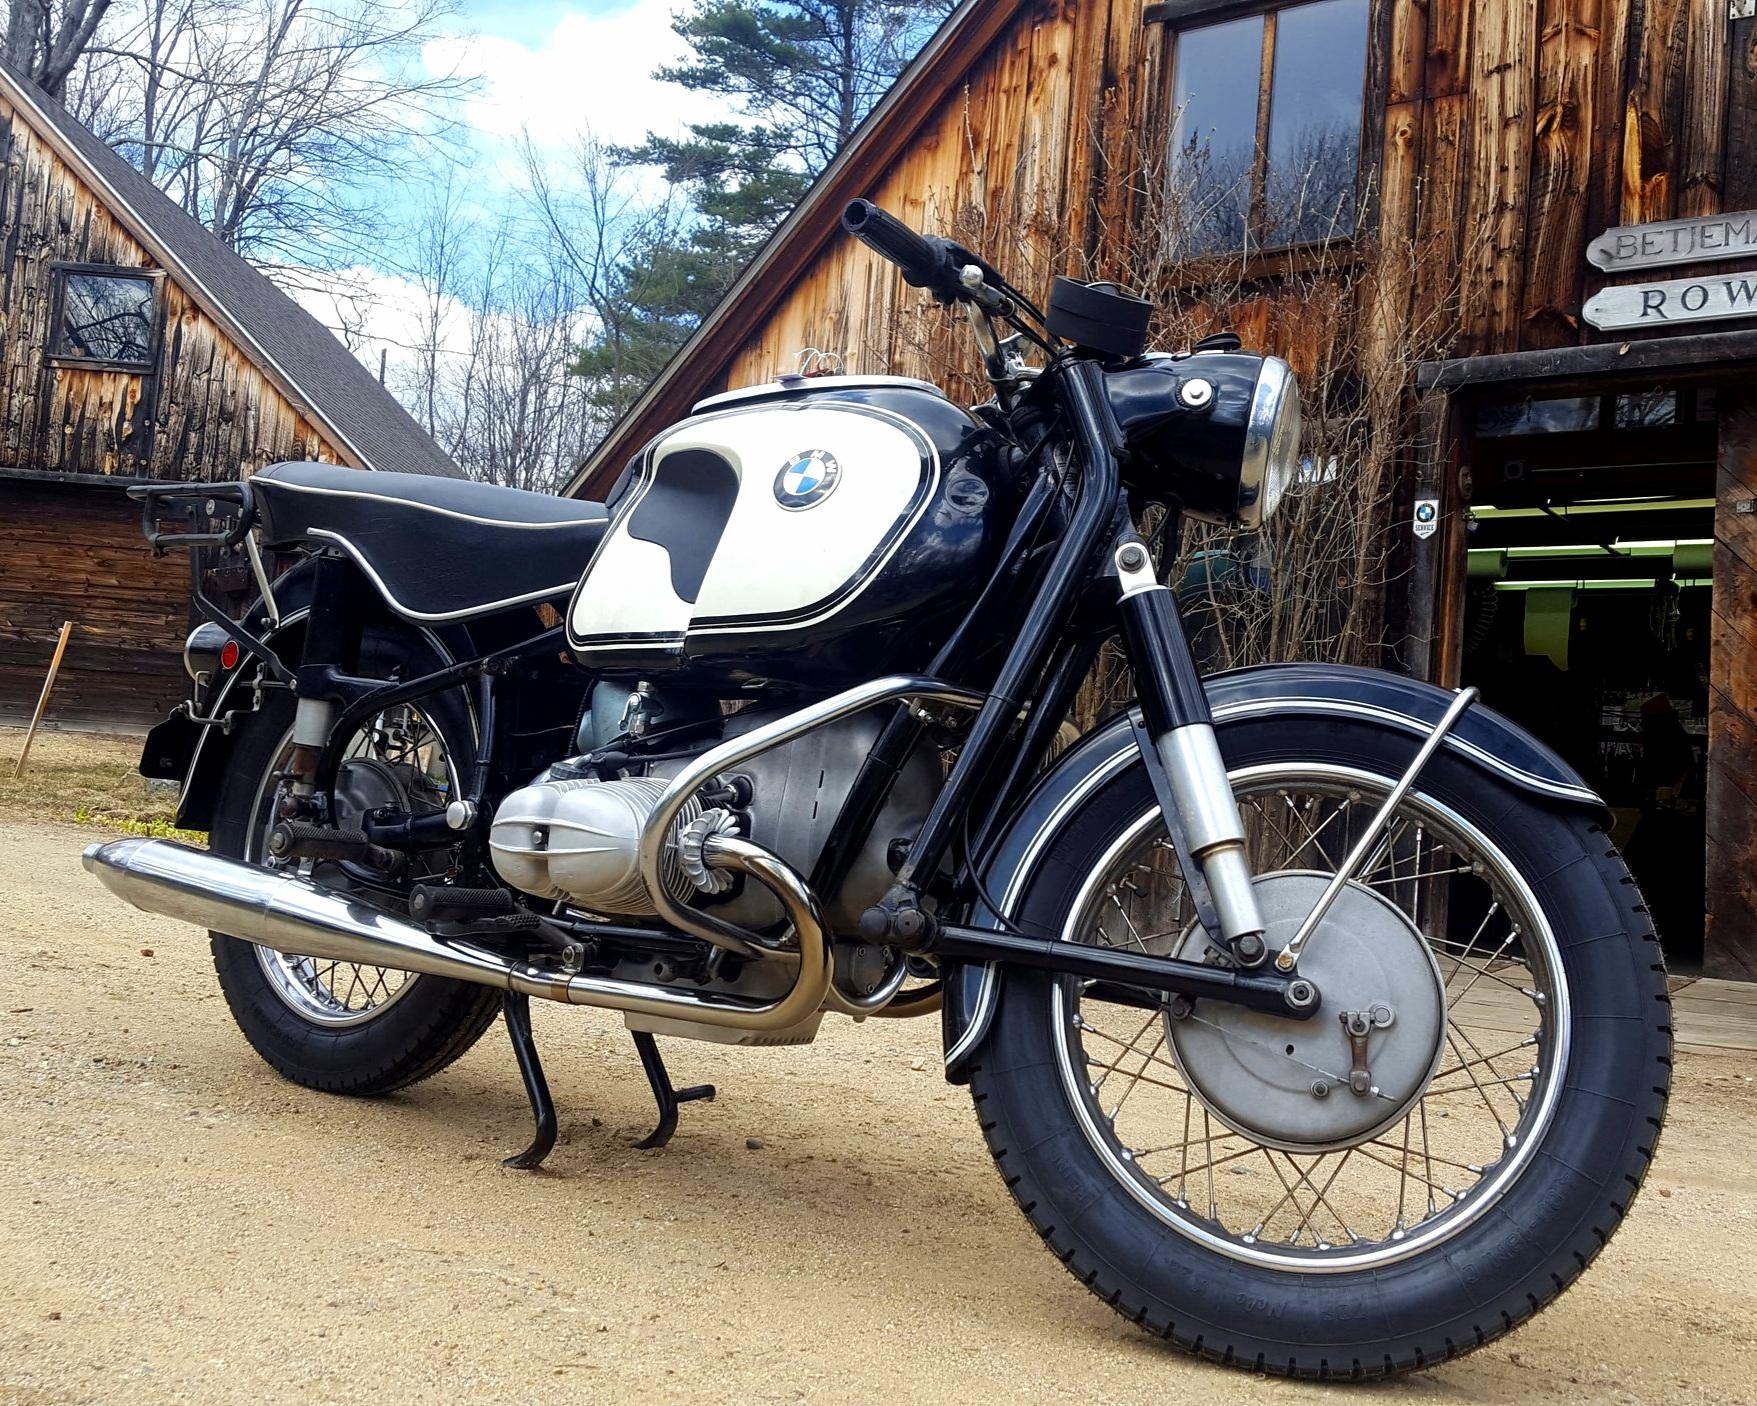 R69S mechanical restoration